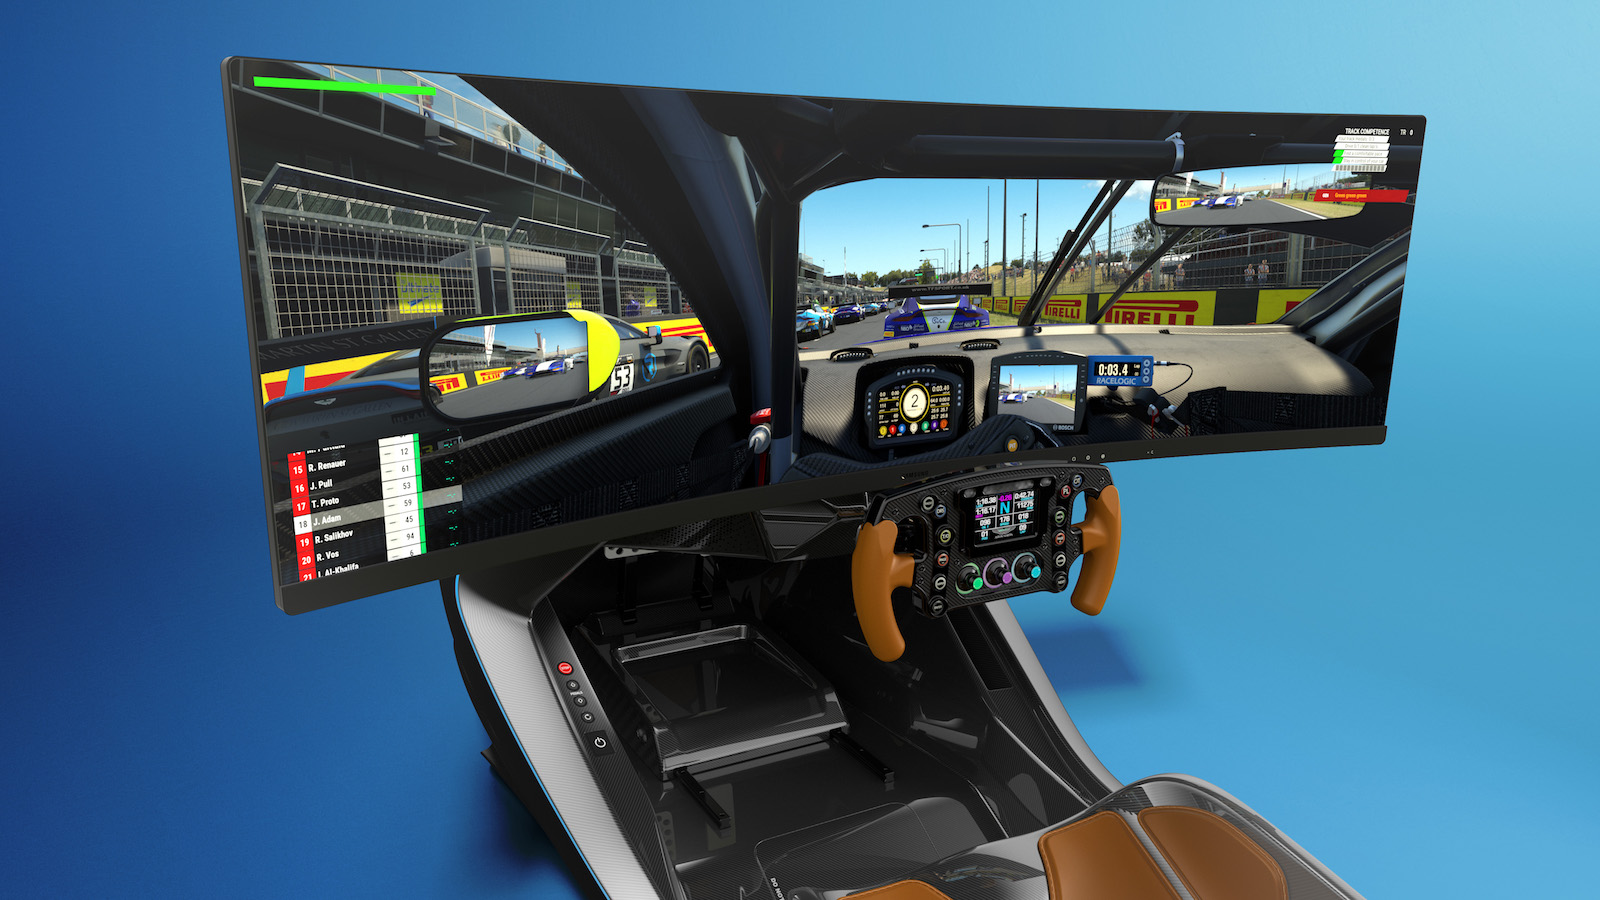 Aston Marton x Curv AMR-C01 racing simulator feels like driving an Aston Marton